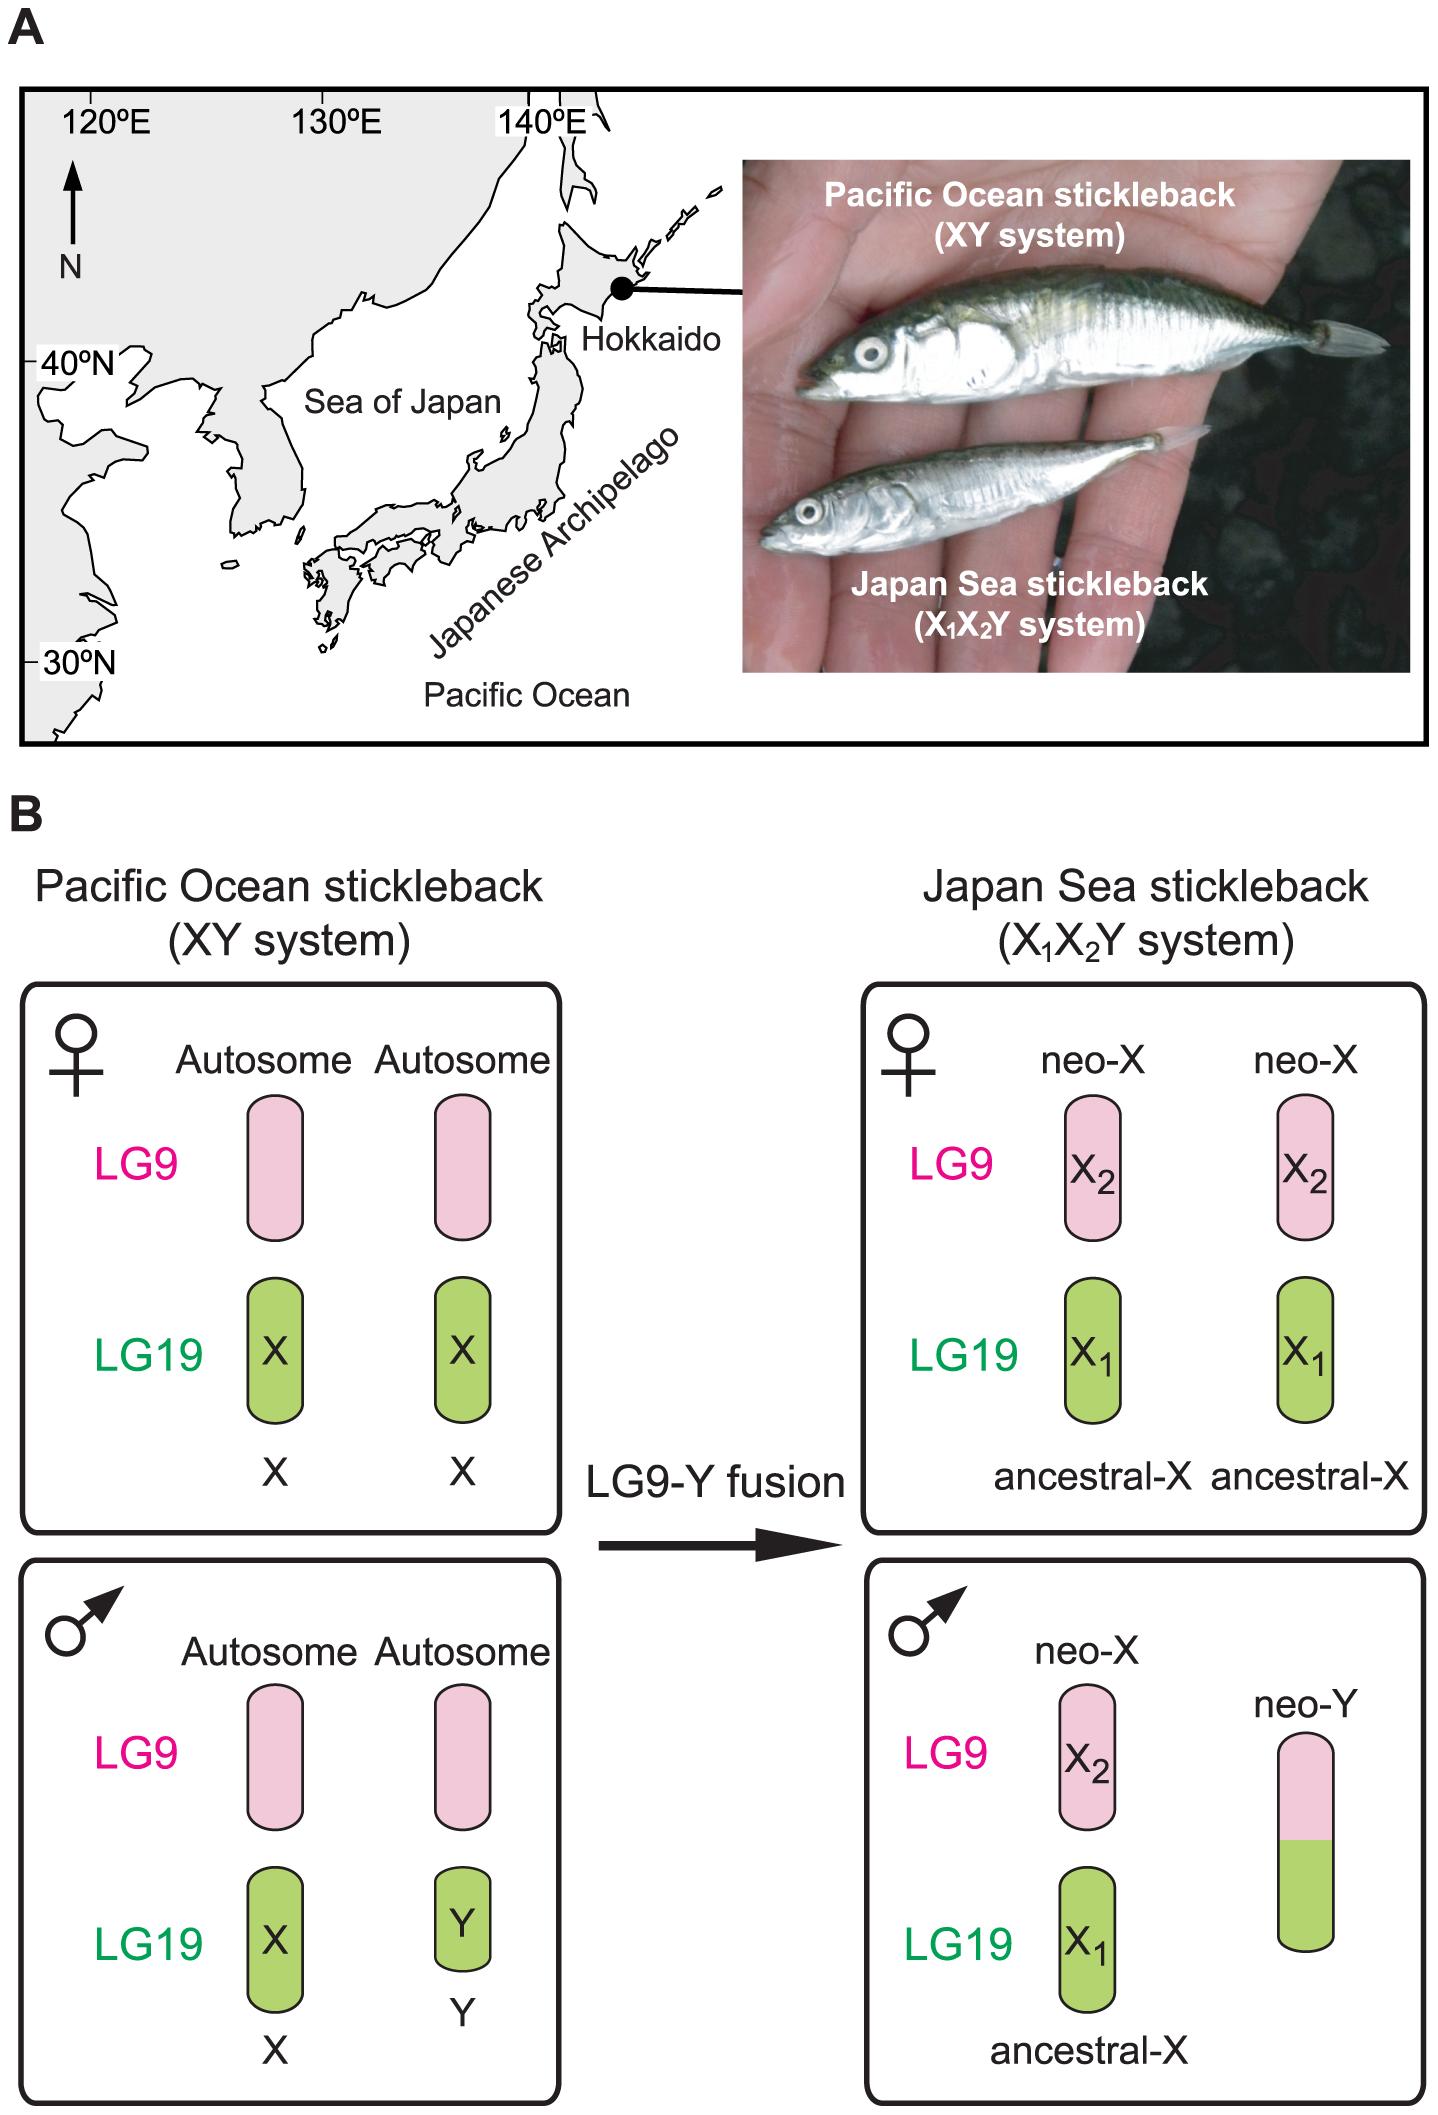 The Japanese sympatric stickleback species pair.